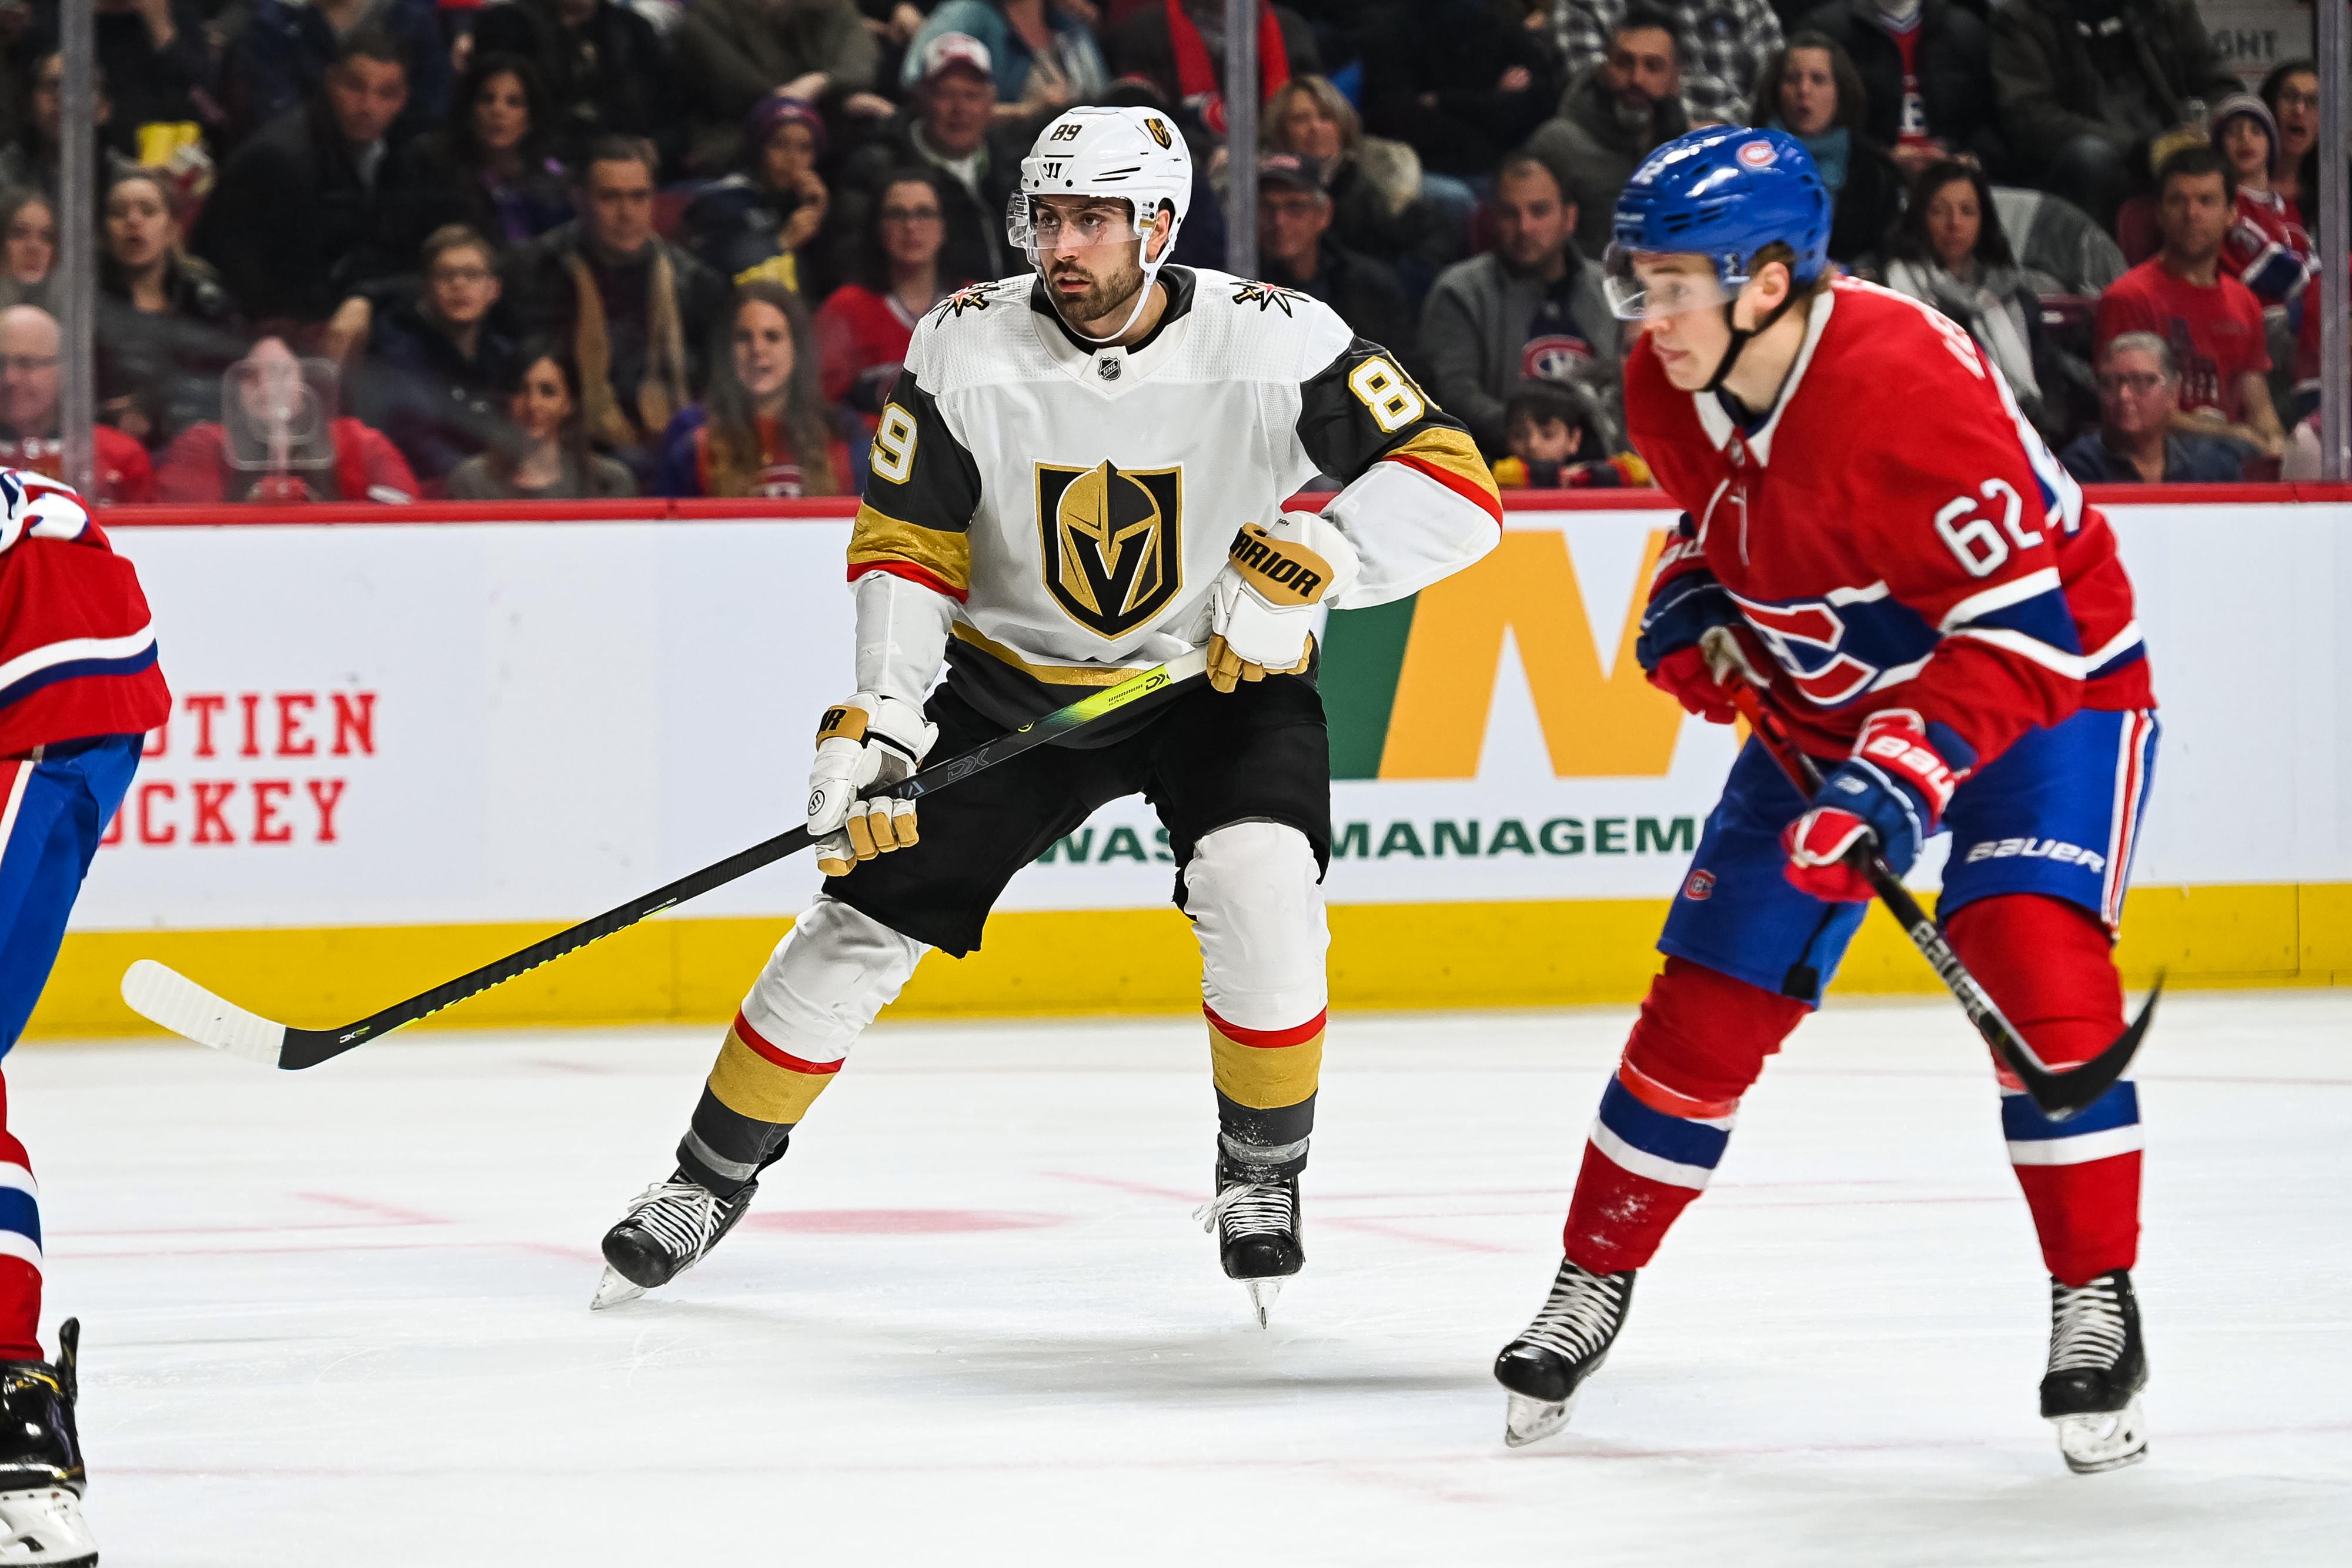 NHL: JAN 18 Golden Knights at Canadiens